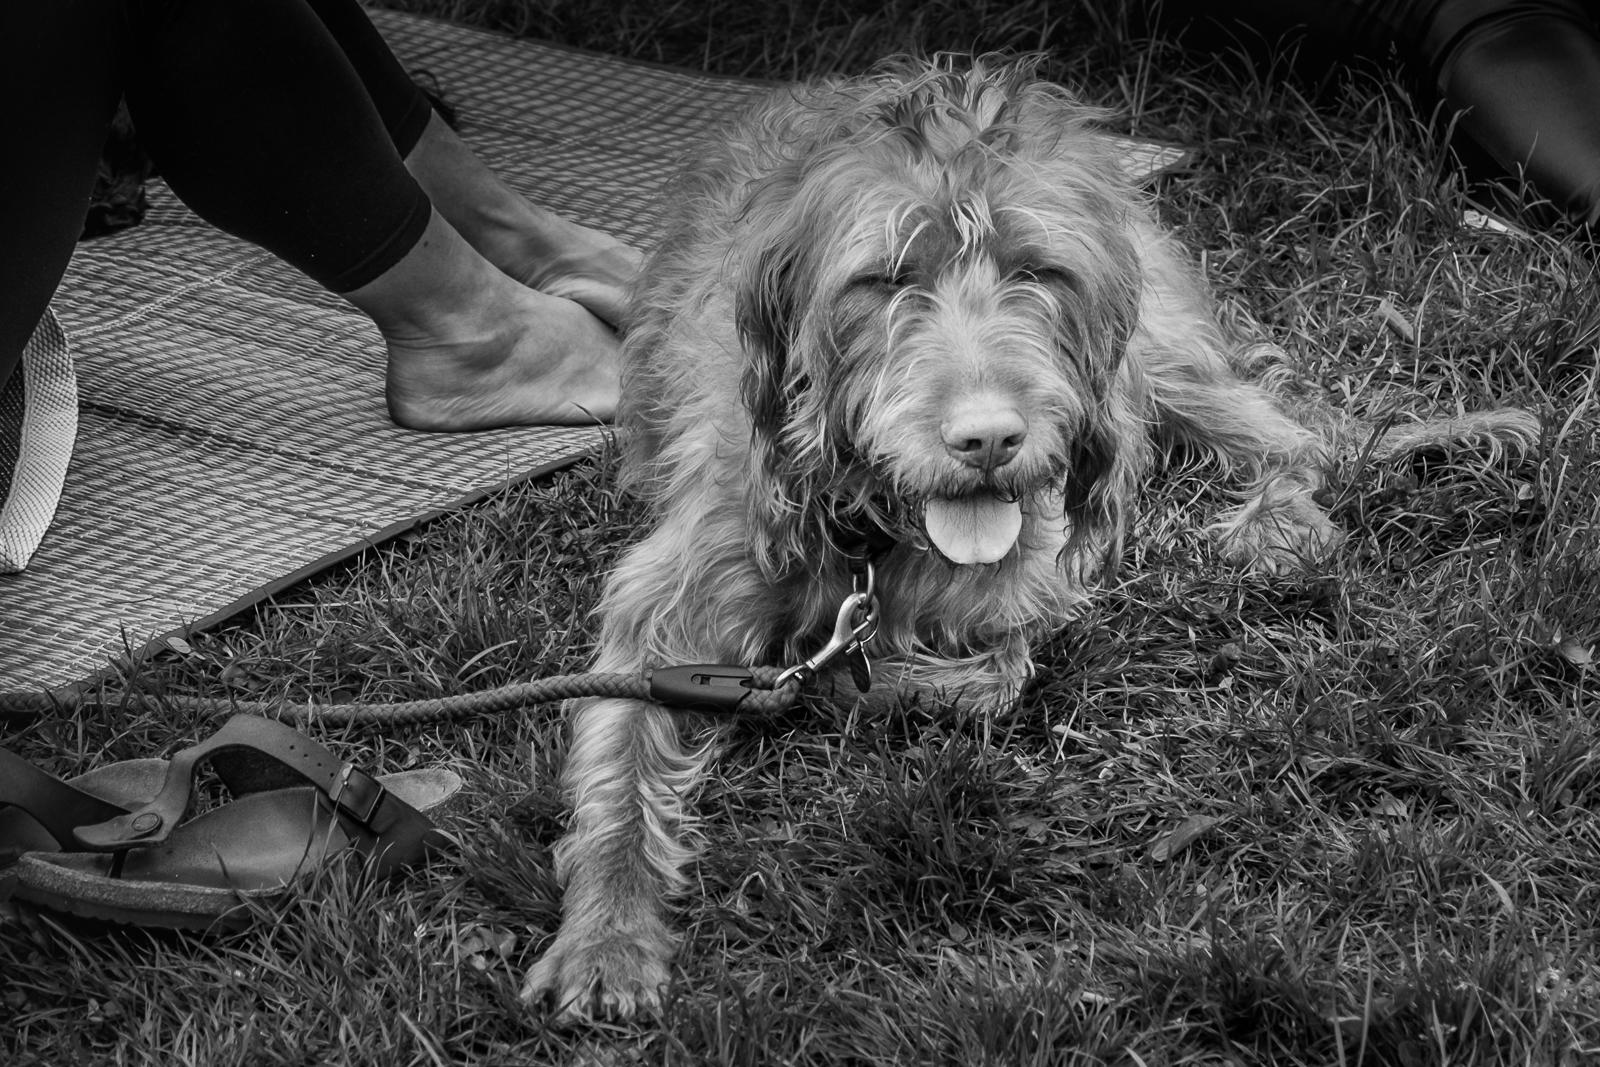 20160604_Lewisham_Hilly-Fields_Shaggy-Dog-Story